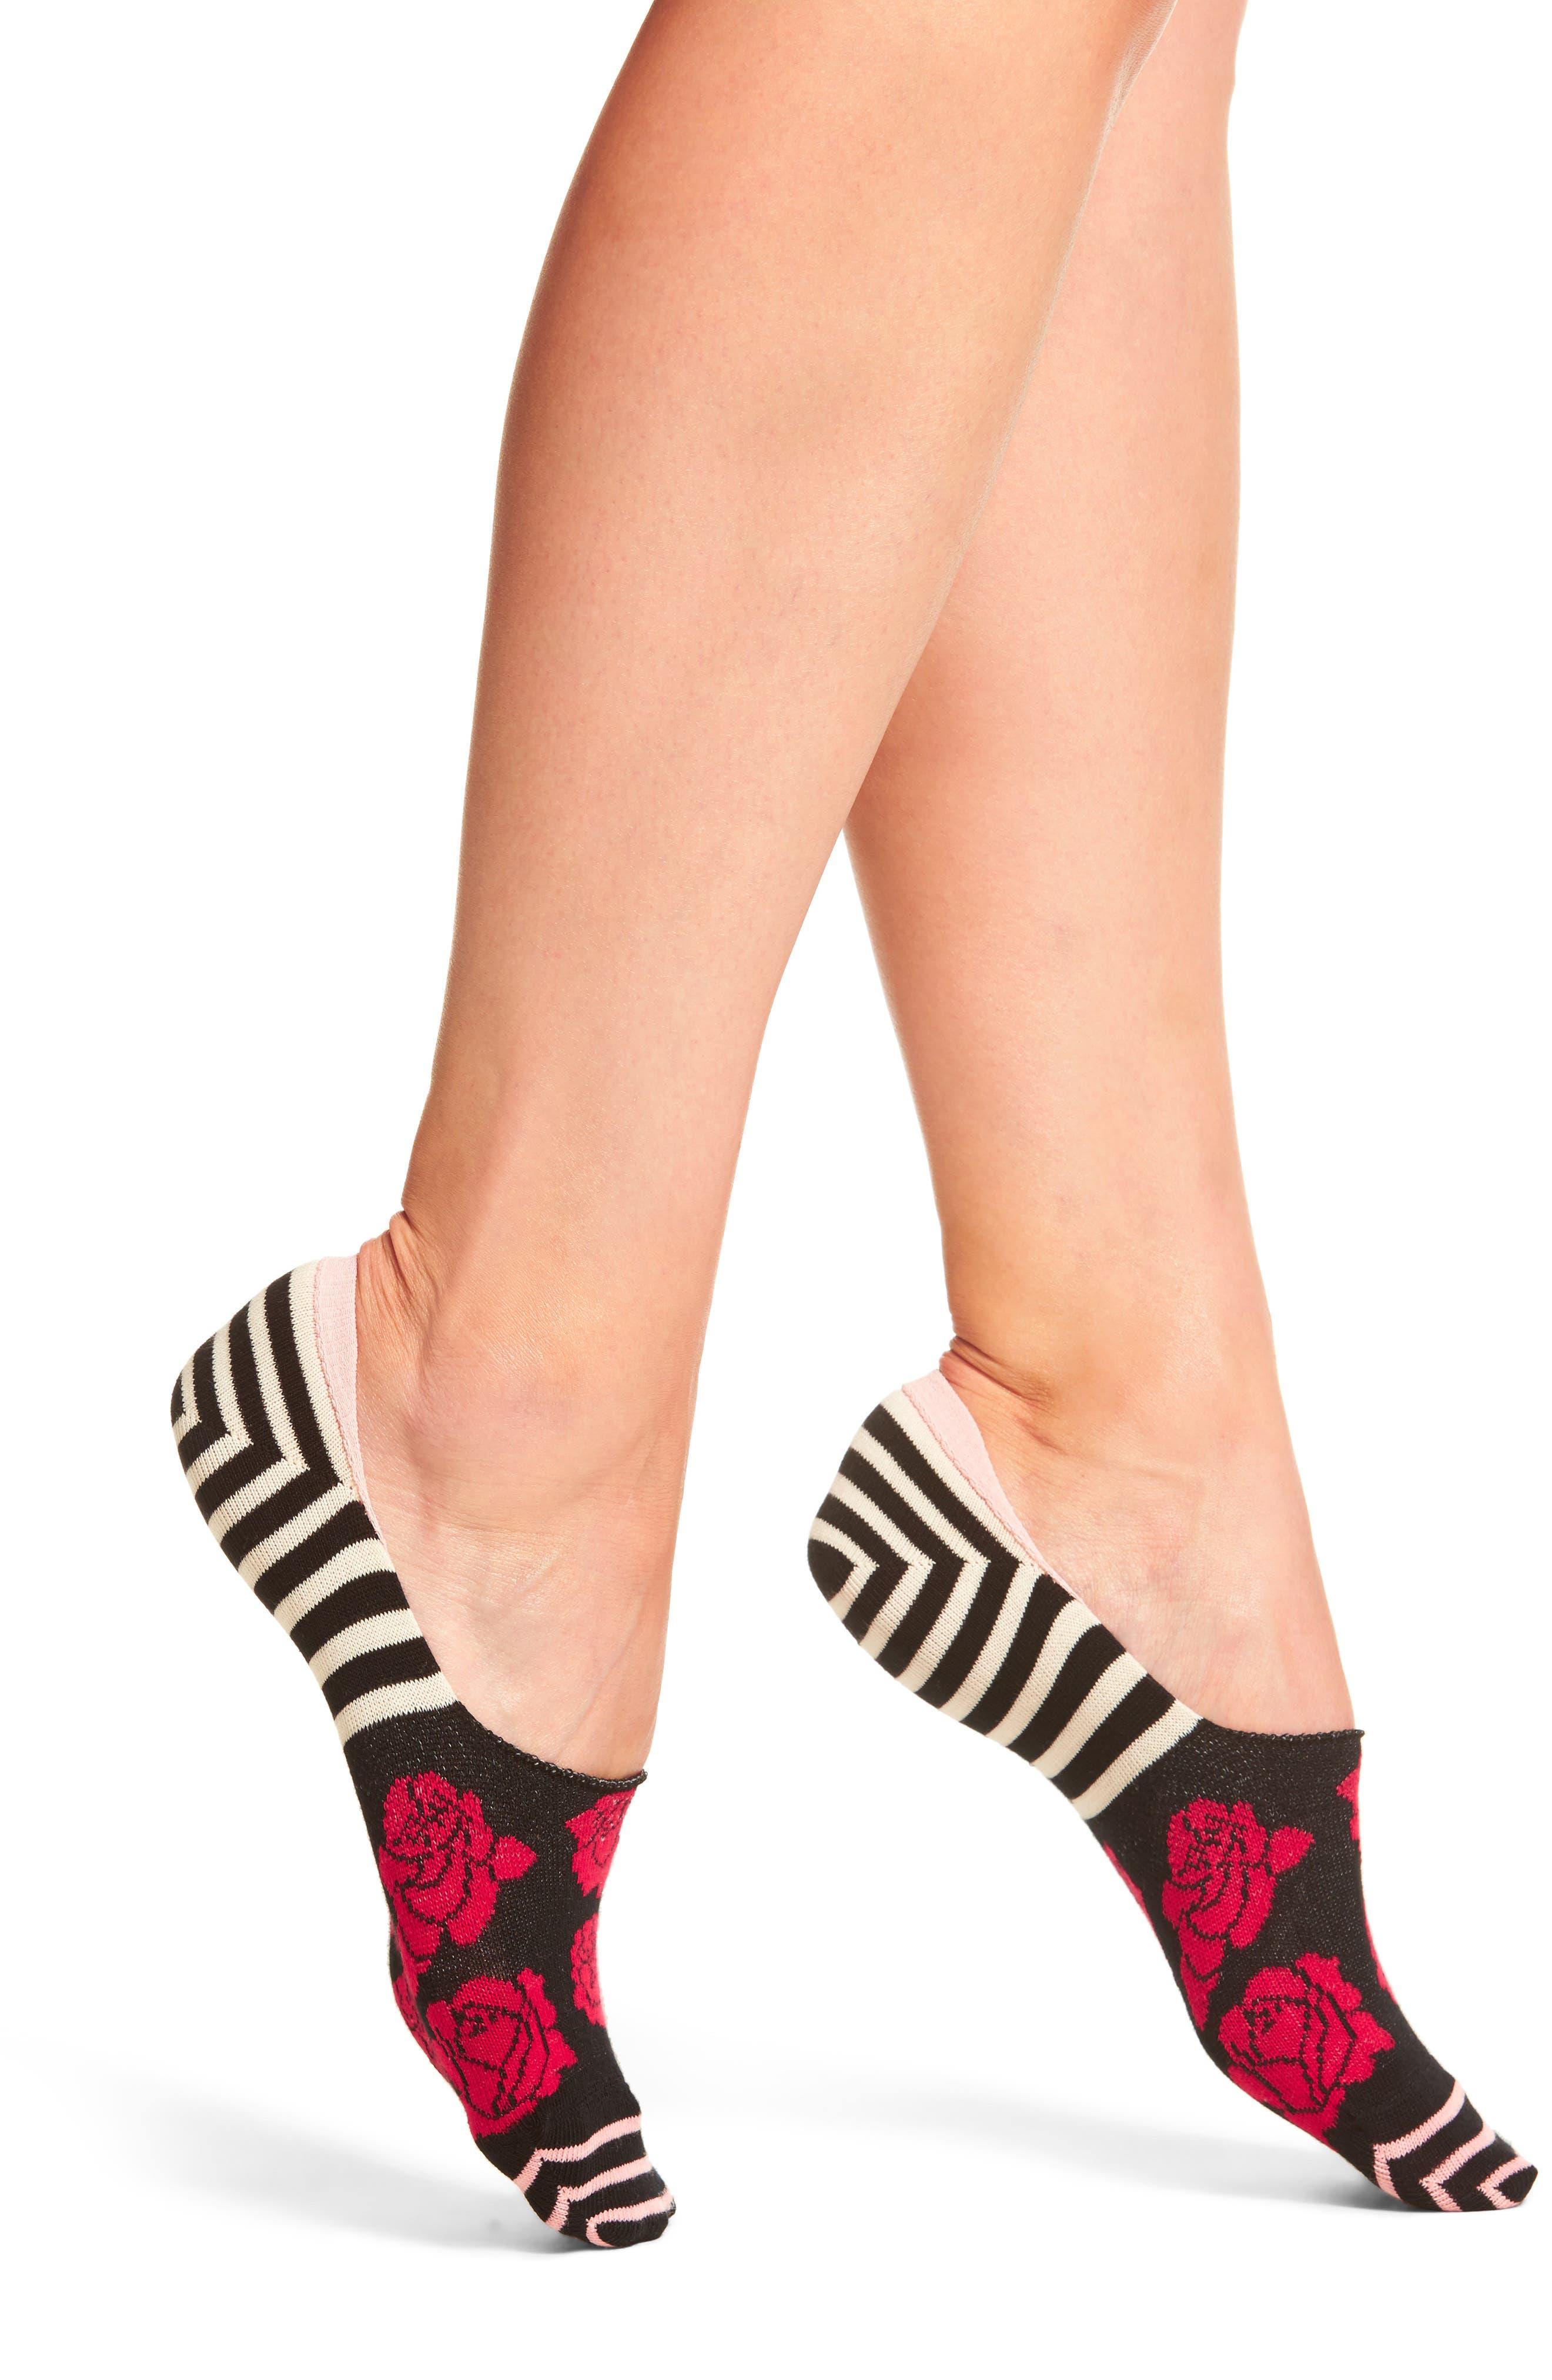 Rose Liner Socks,                         Main,                         color, 005